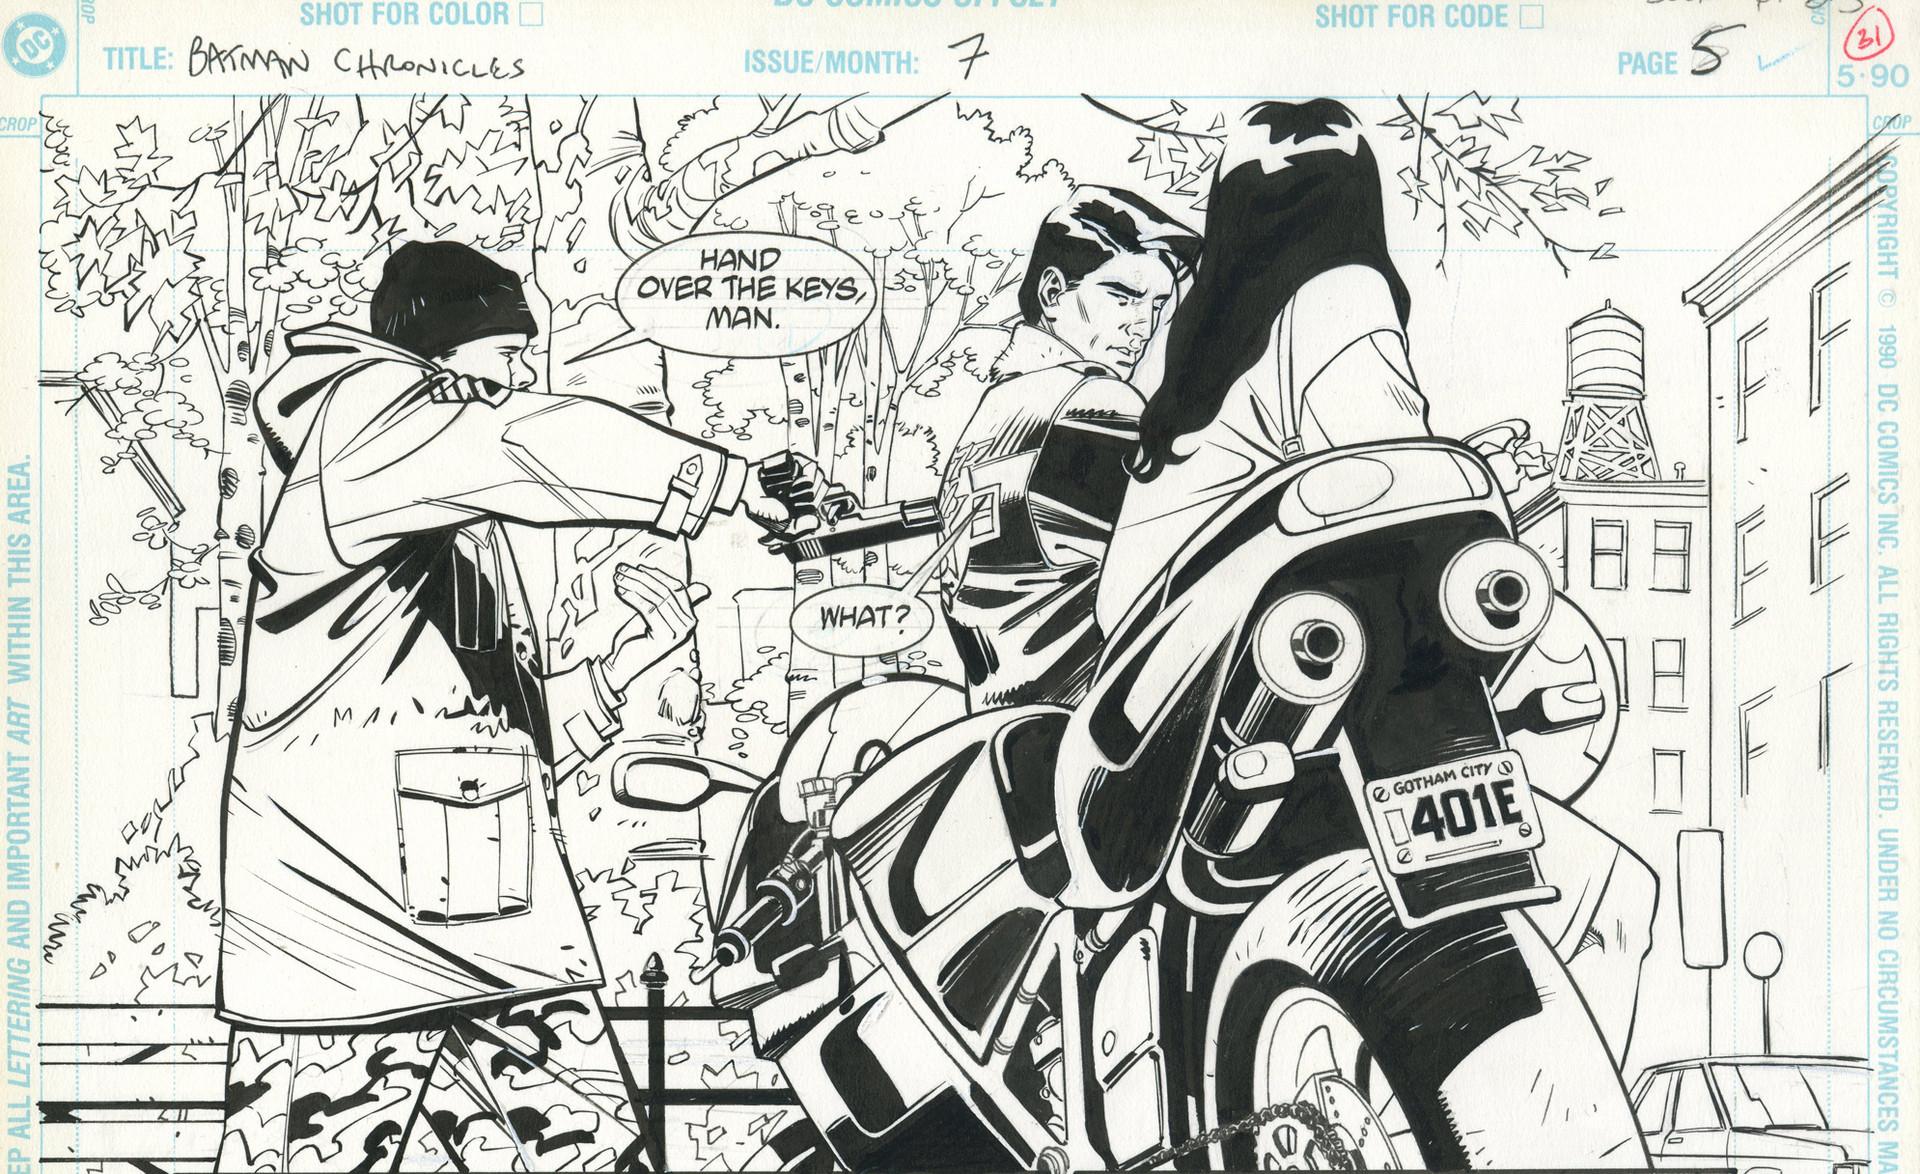 Rodolfo damaggio nightwing page3100